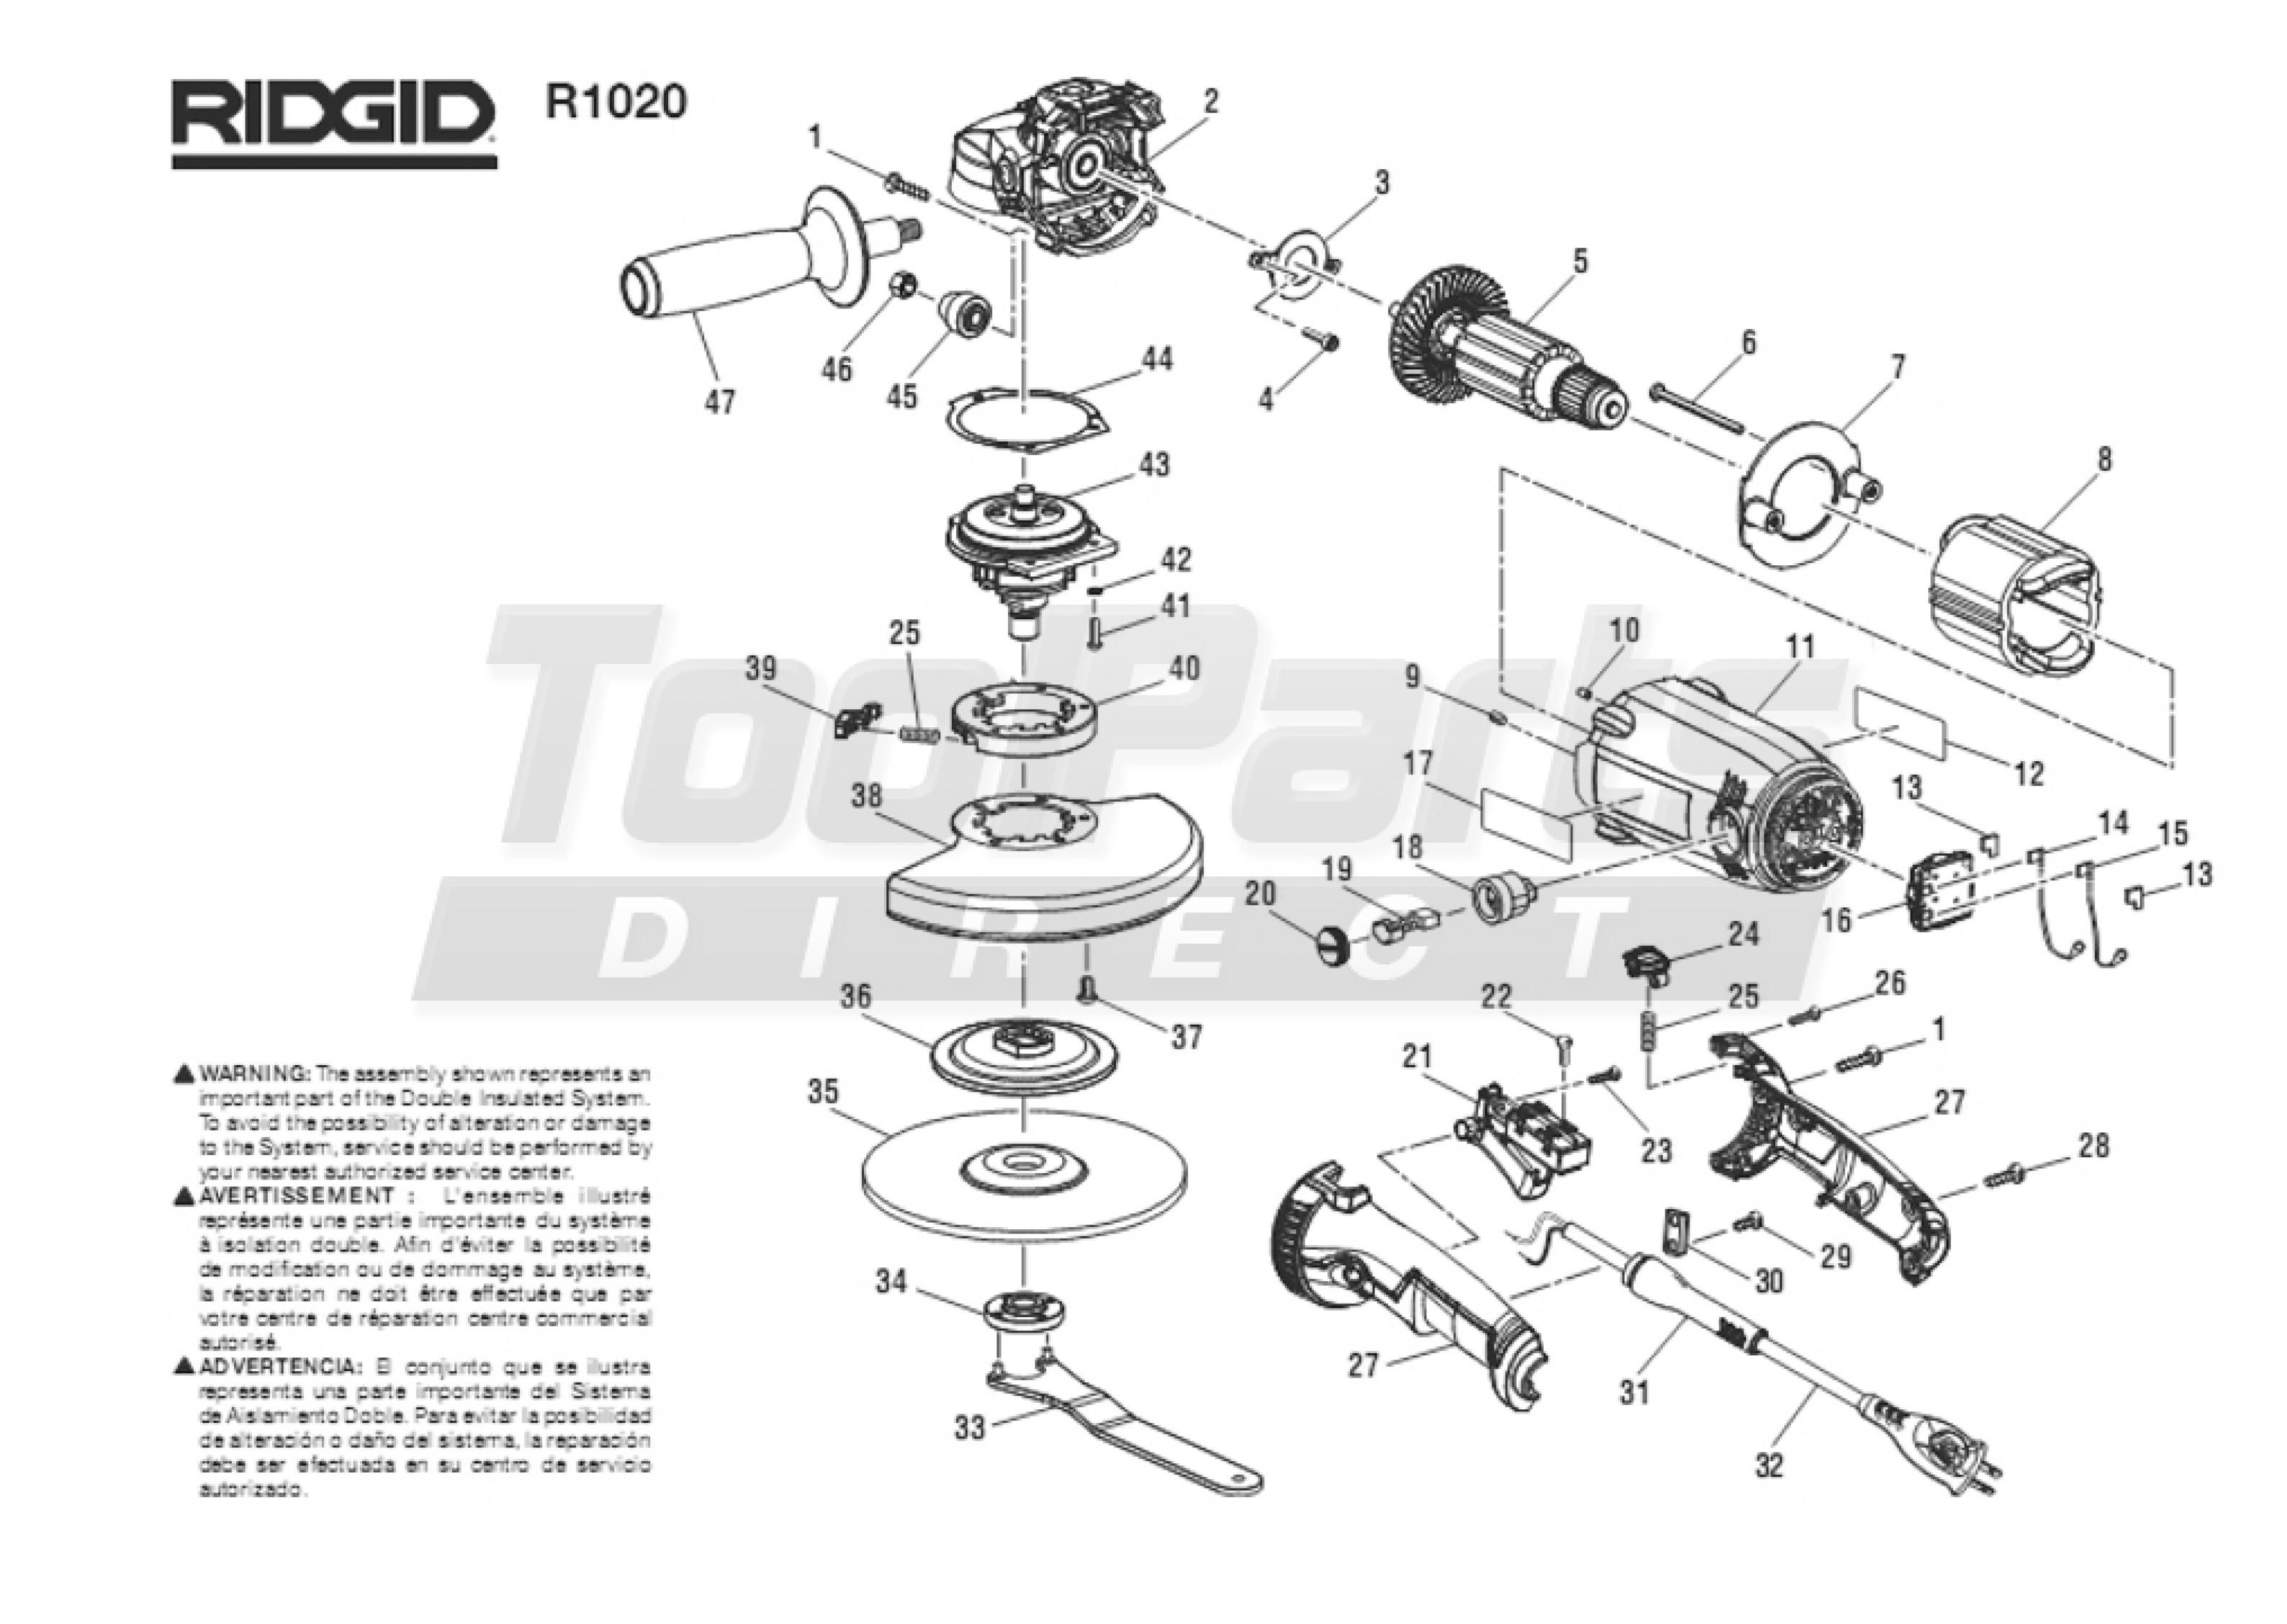 Meat Grinder Parts Diagram Printable Wiring Diagram Schematic - WIRE ...